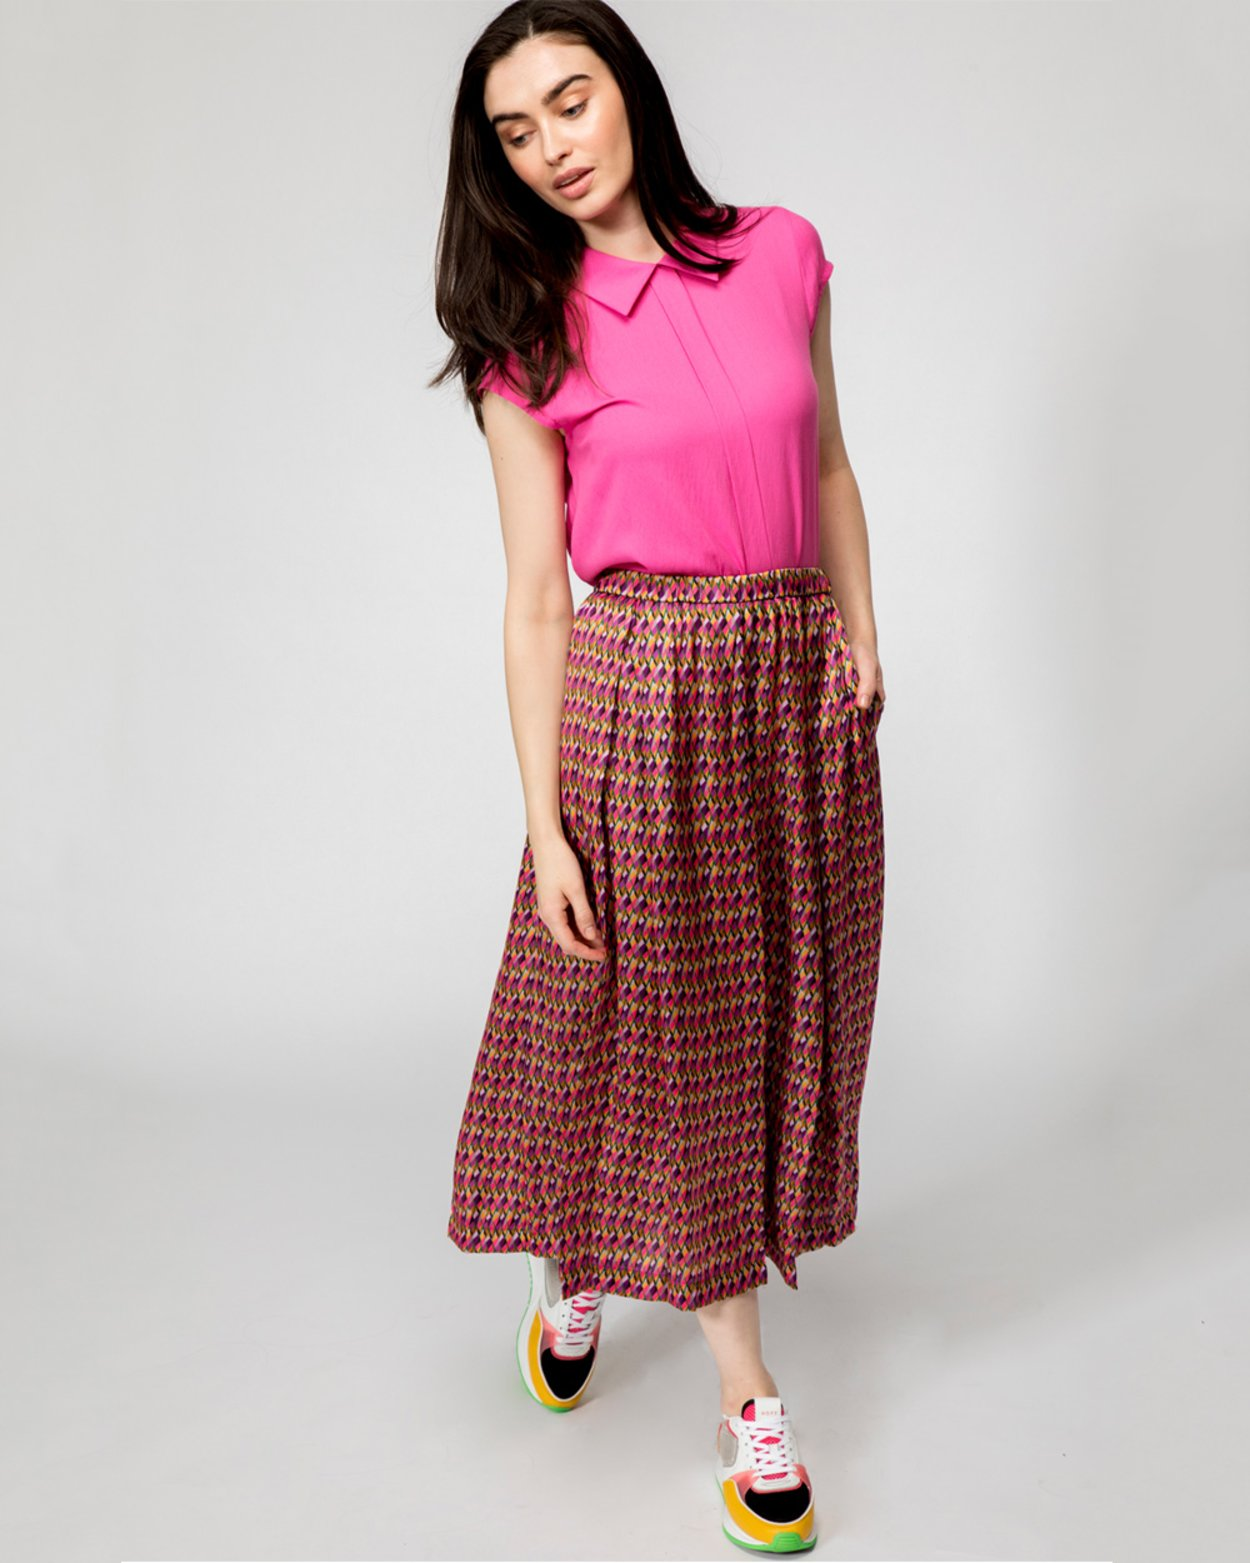 Chatsworth Skirt